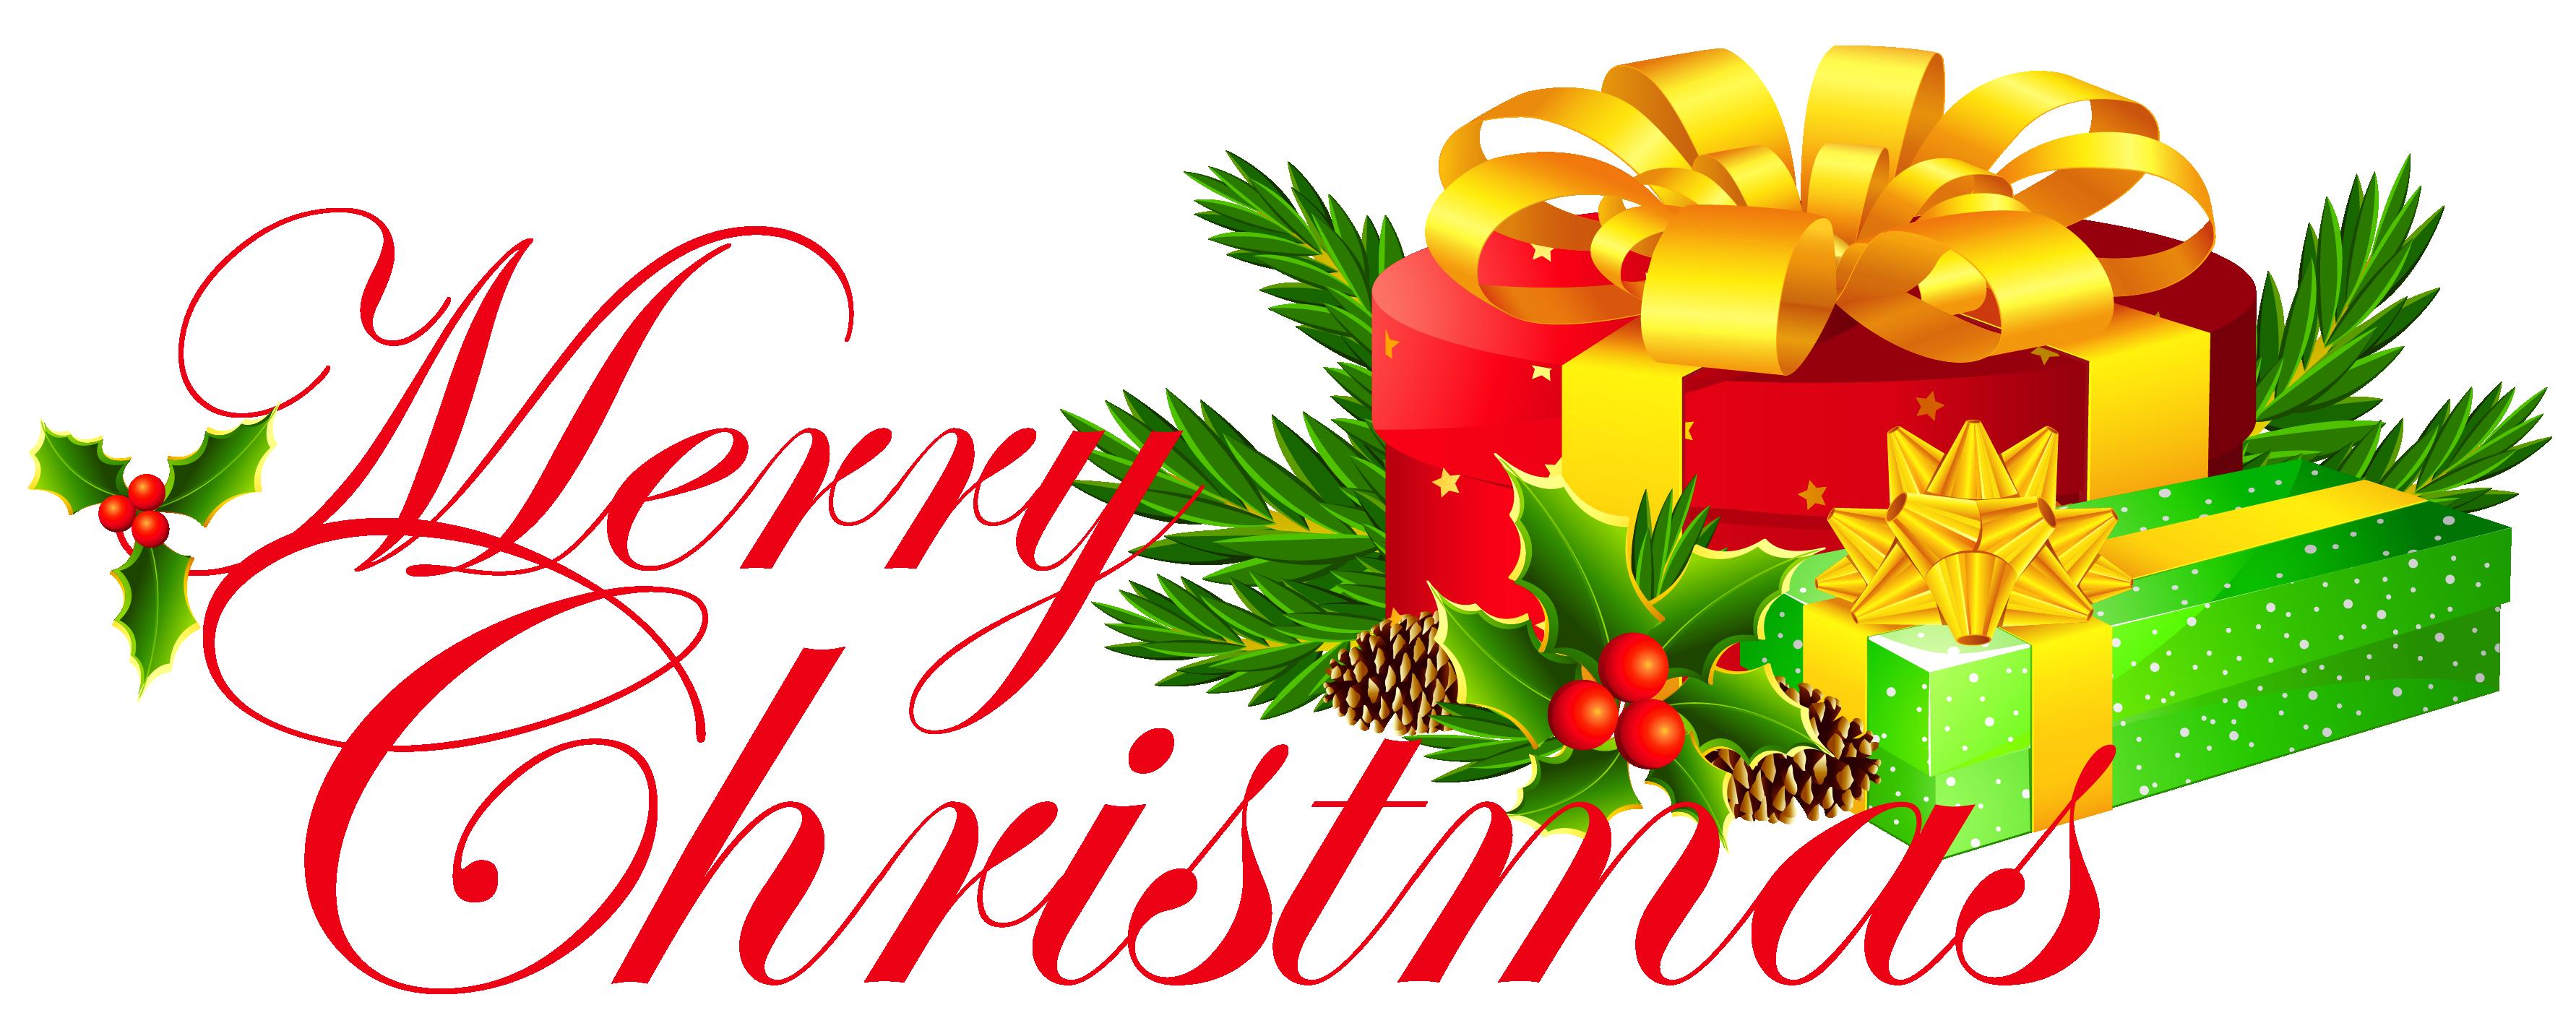 Christmas clip art santa behind a christmas tree clip art.